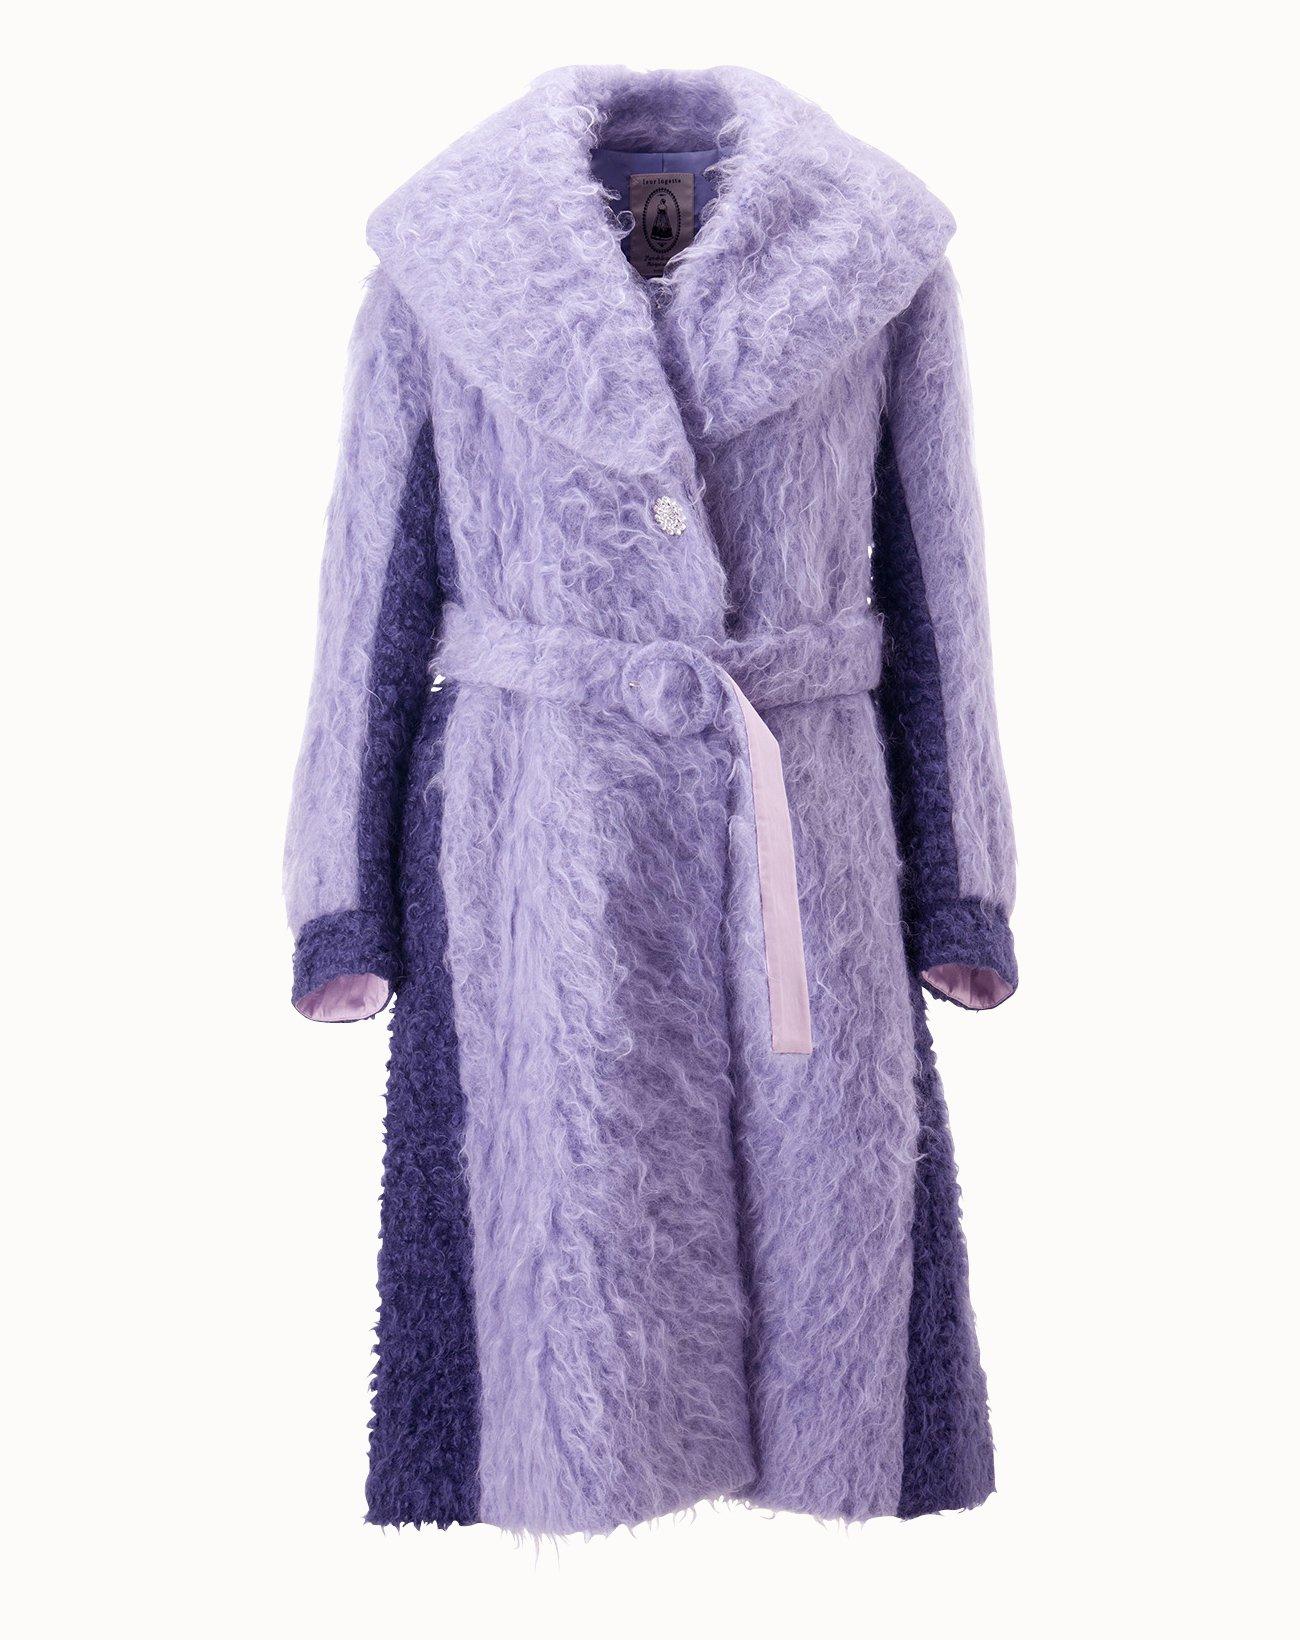 Shaggy Coat - Purple